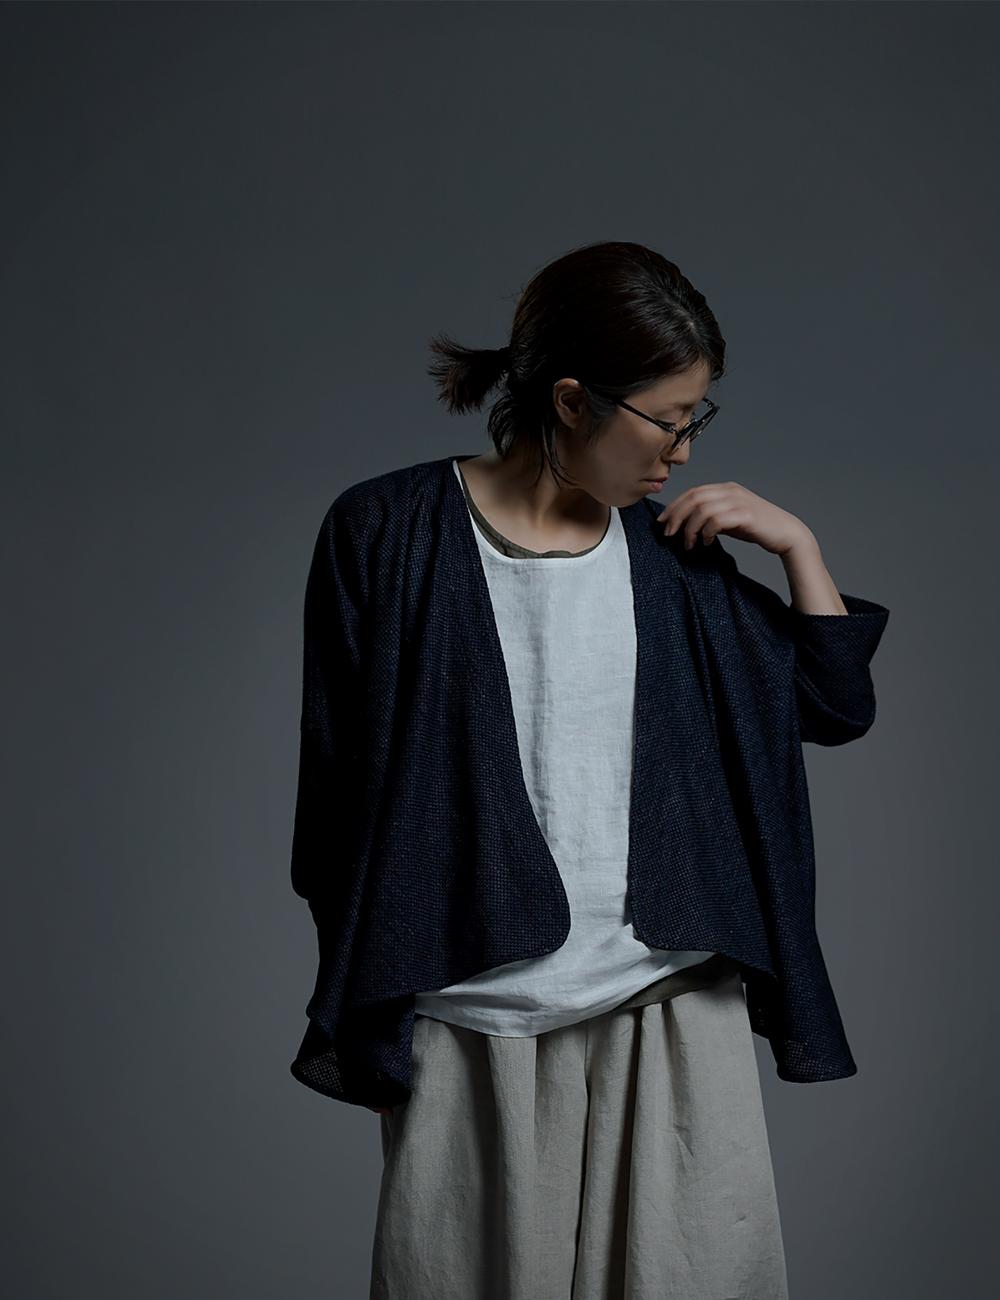 【wafu】 Linen Drape Bolero ドレープ ボレロ/ネイビー h021e-neb2